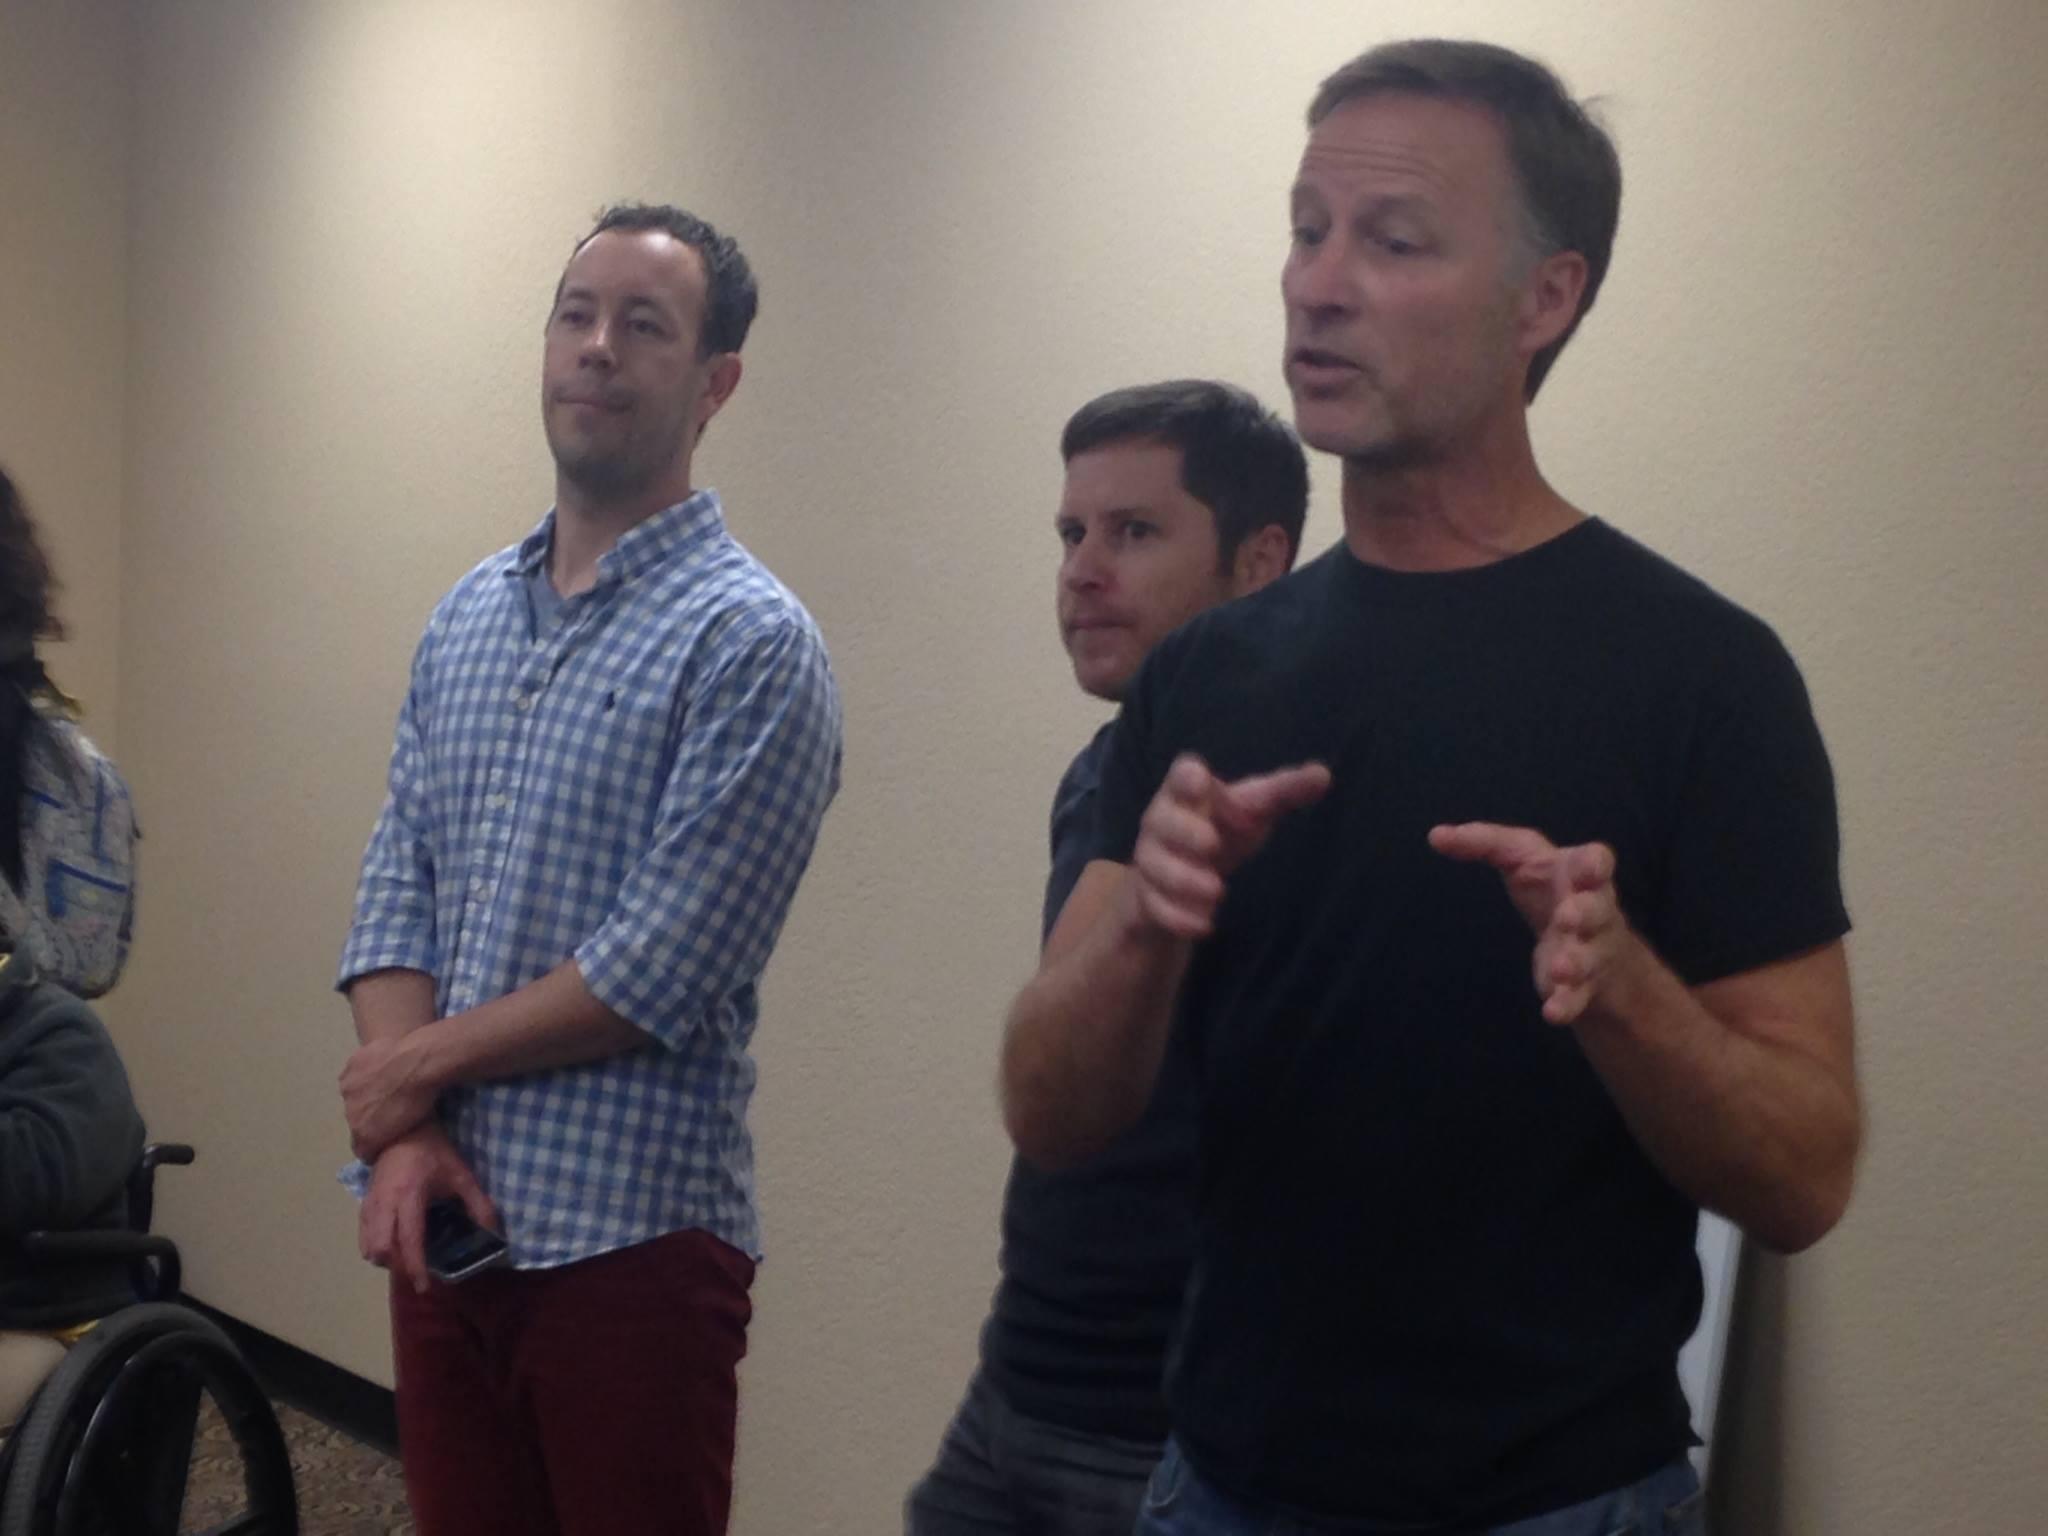 Matt Miller (left) listens as Michael Bisch (far) right speaks with Bill Habicht (center)